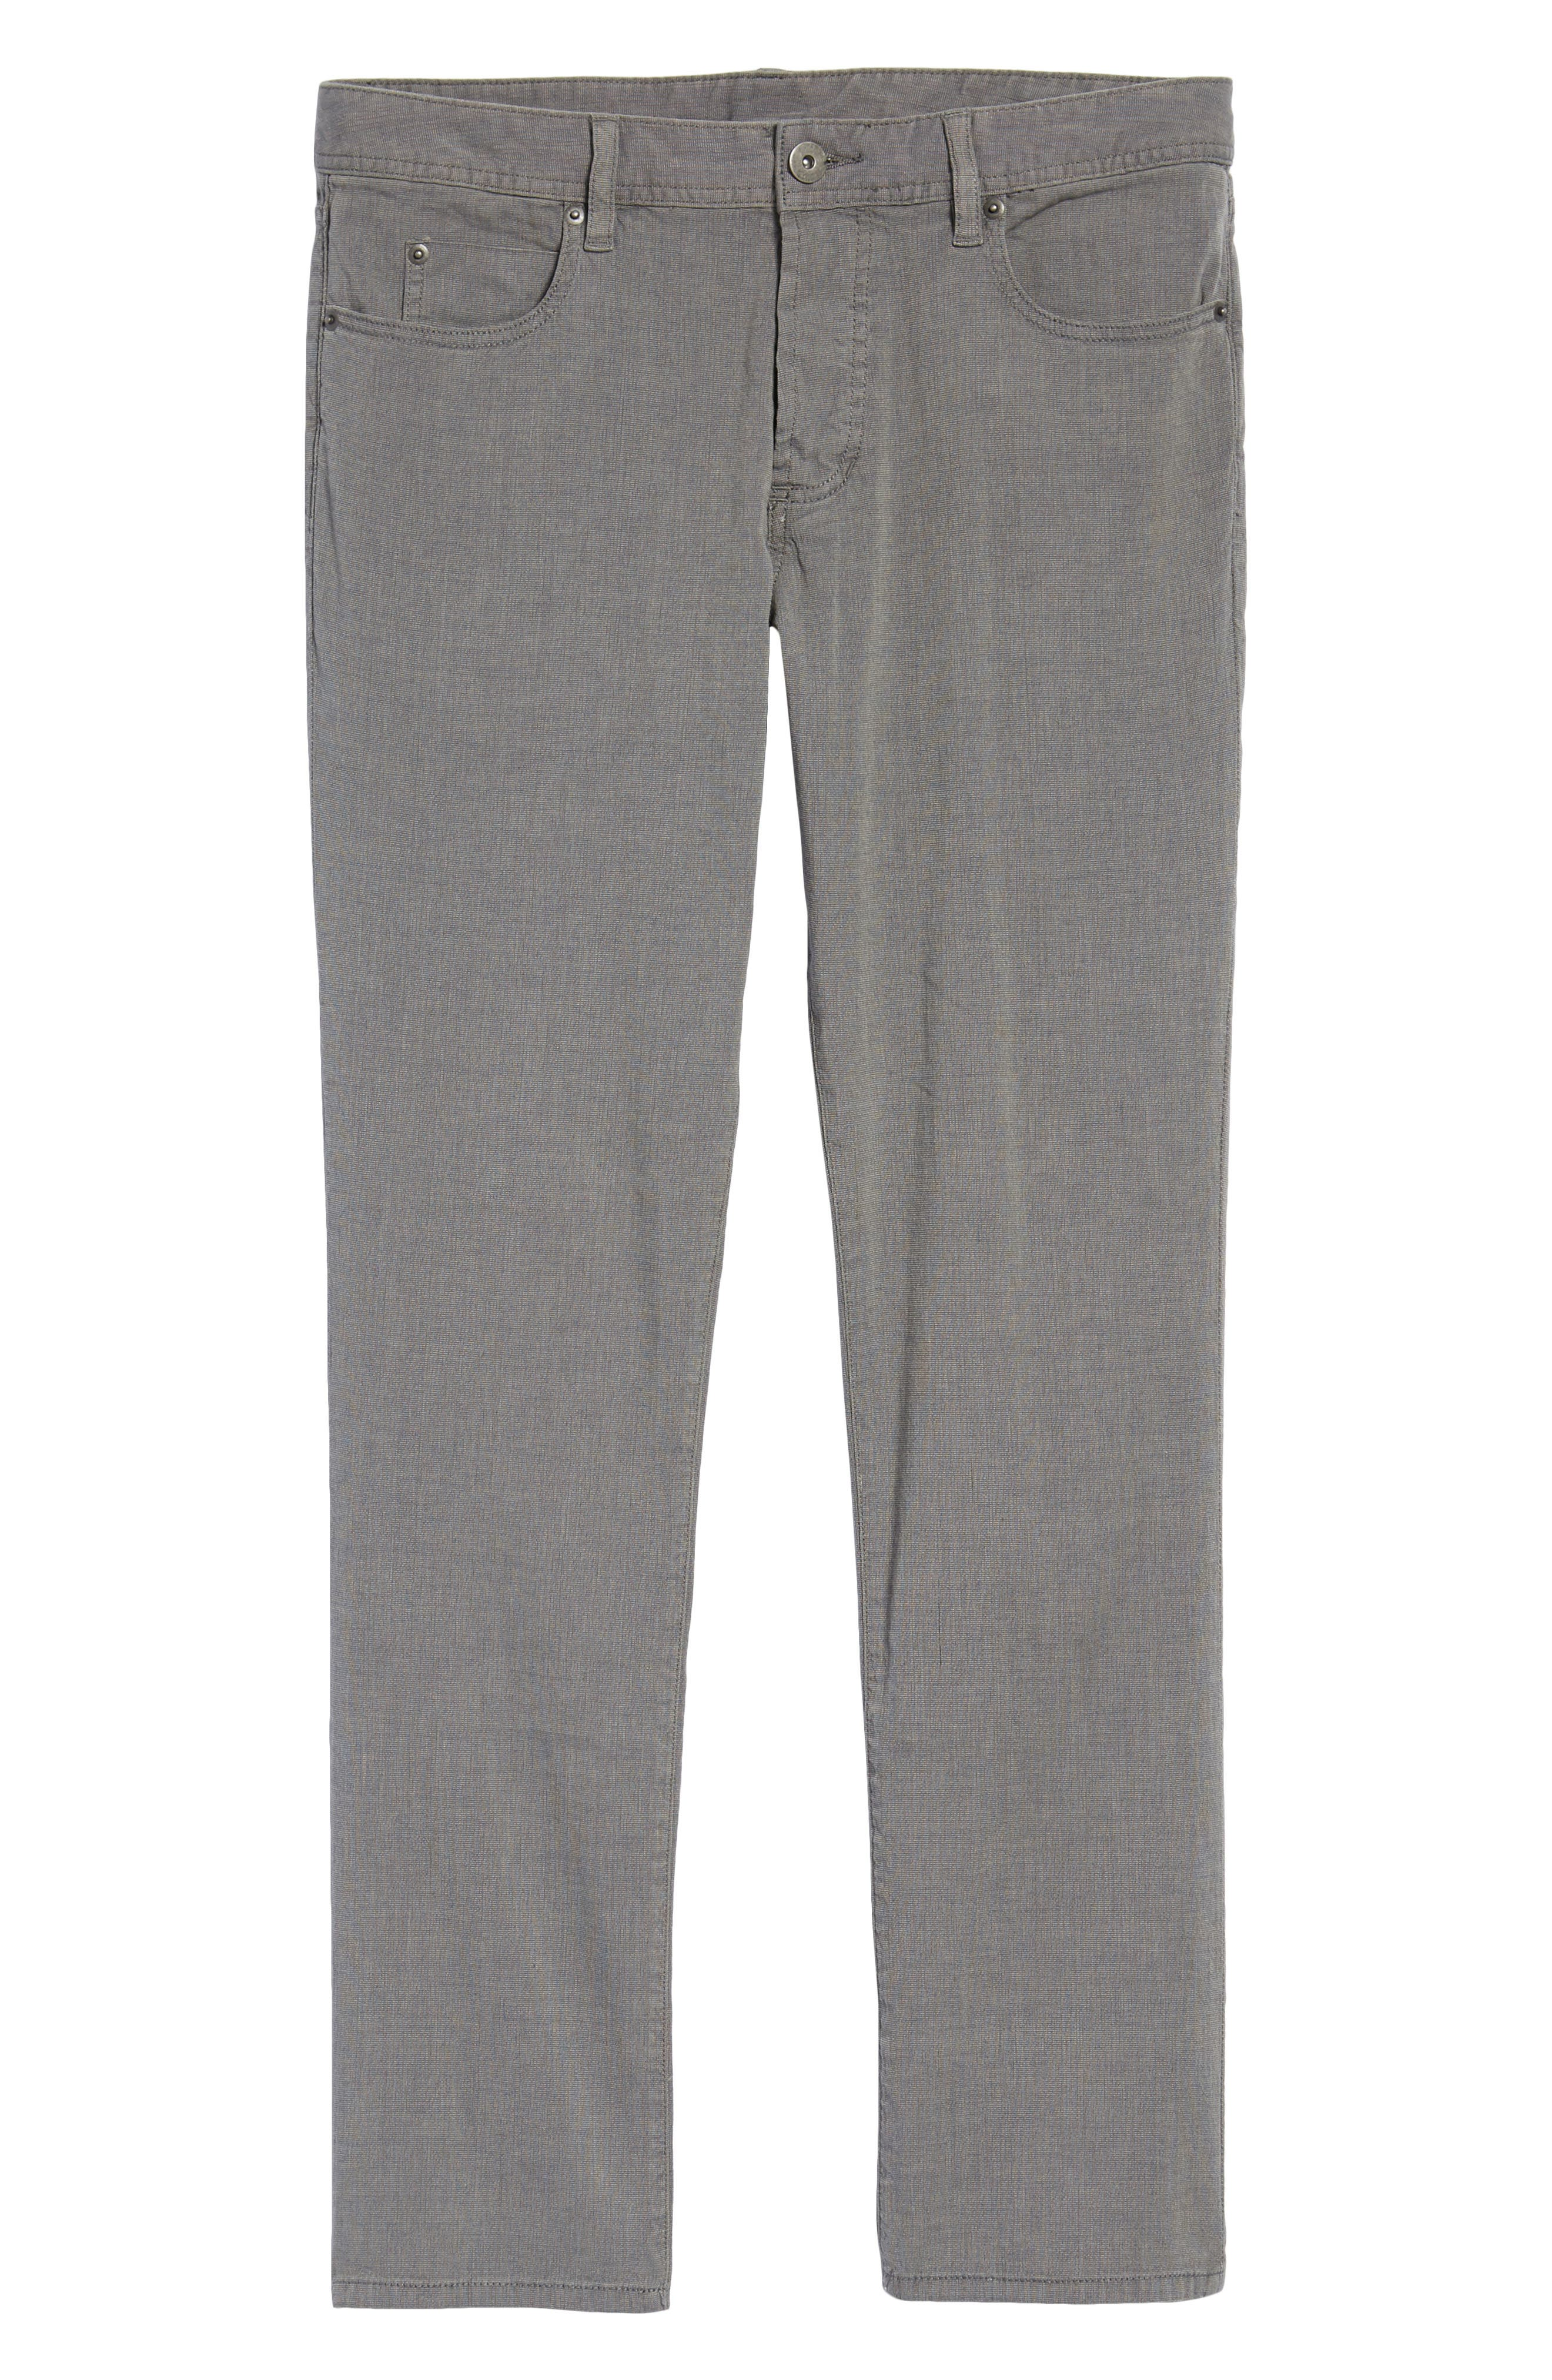 Straight Leg Five-Pocket Pants,                             Alternate thumbnail 5, color,                             Grey